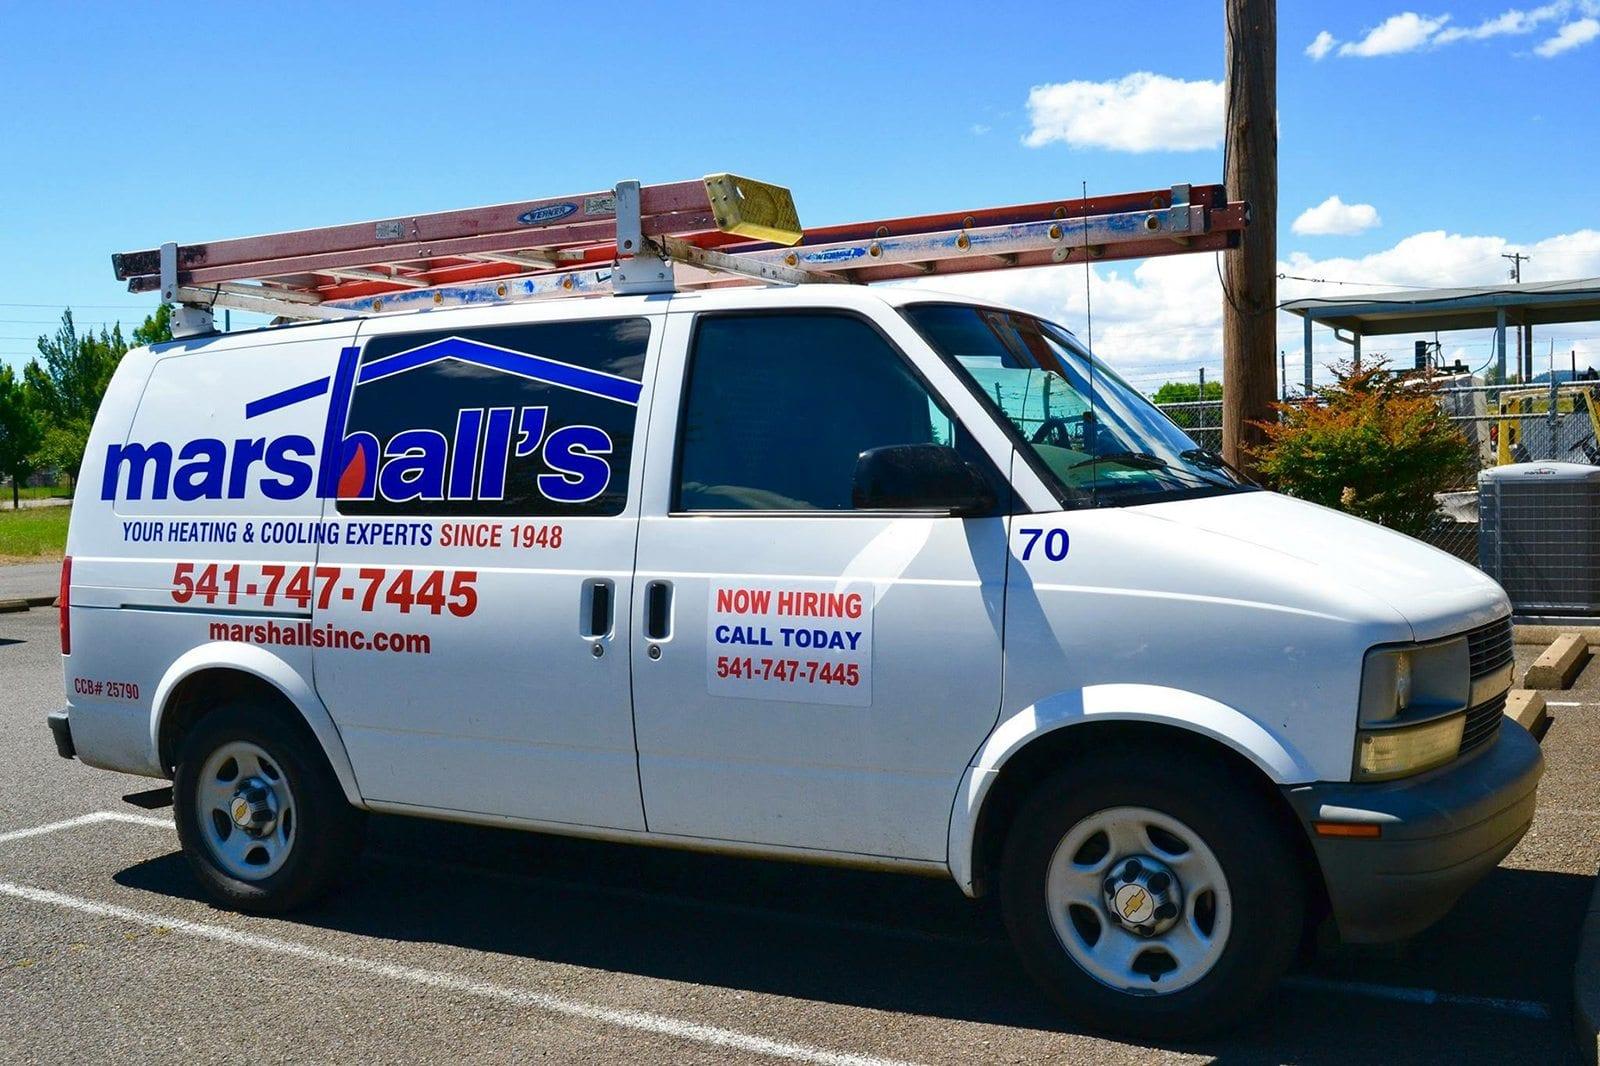 Marshall's HVAC Service Van